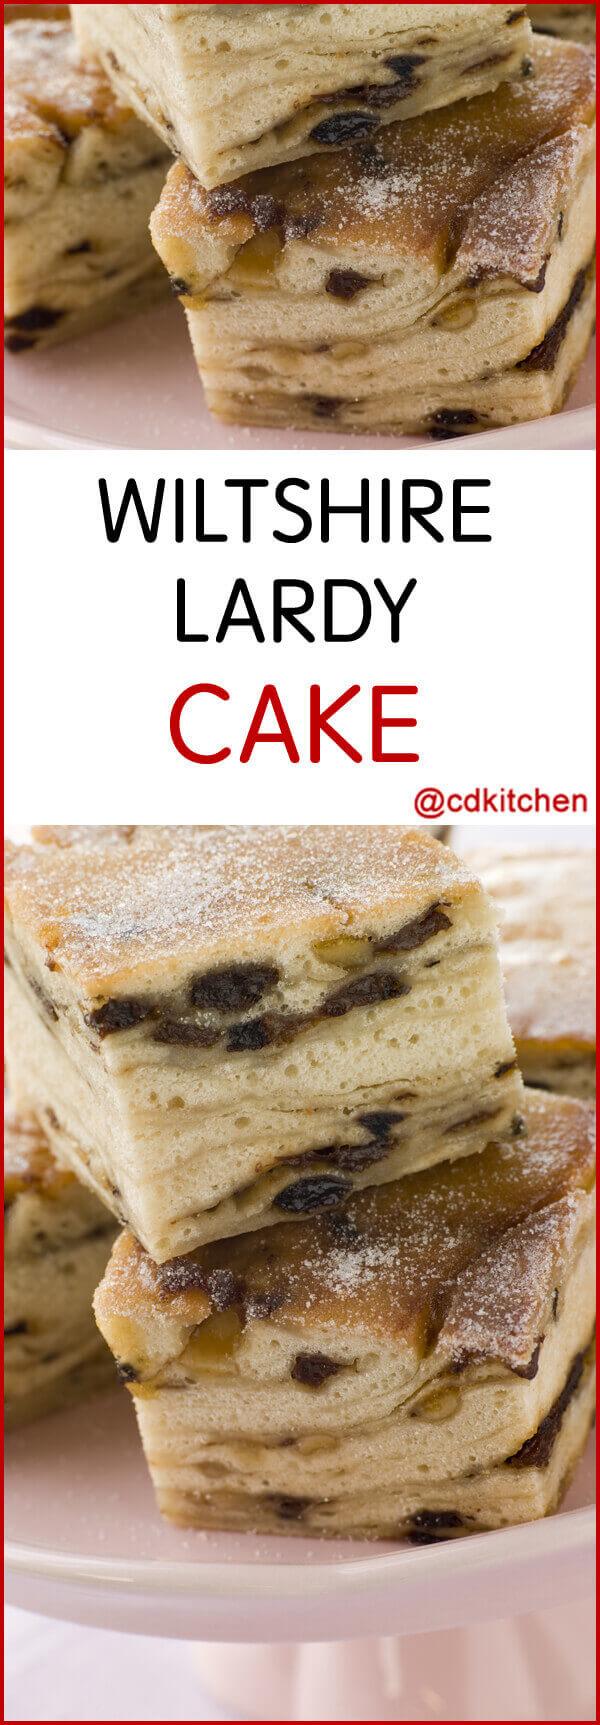 Make Wiltshire Lardy Cake